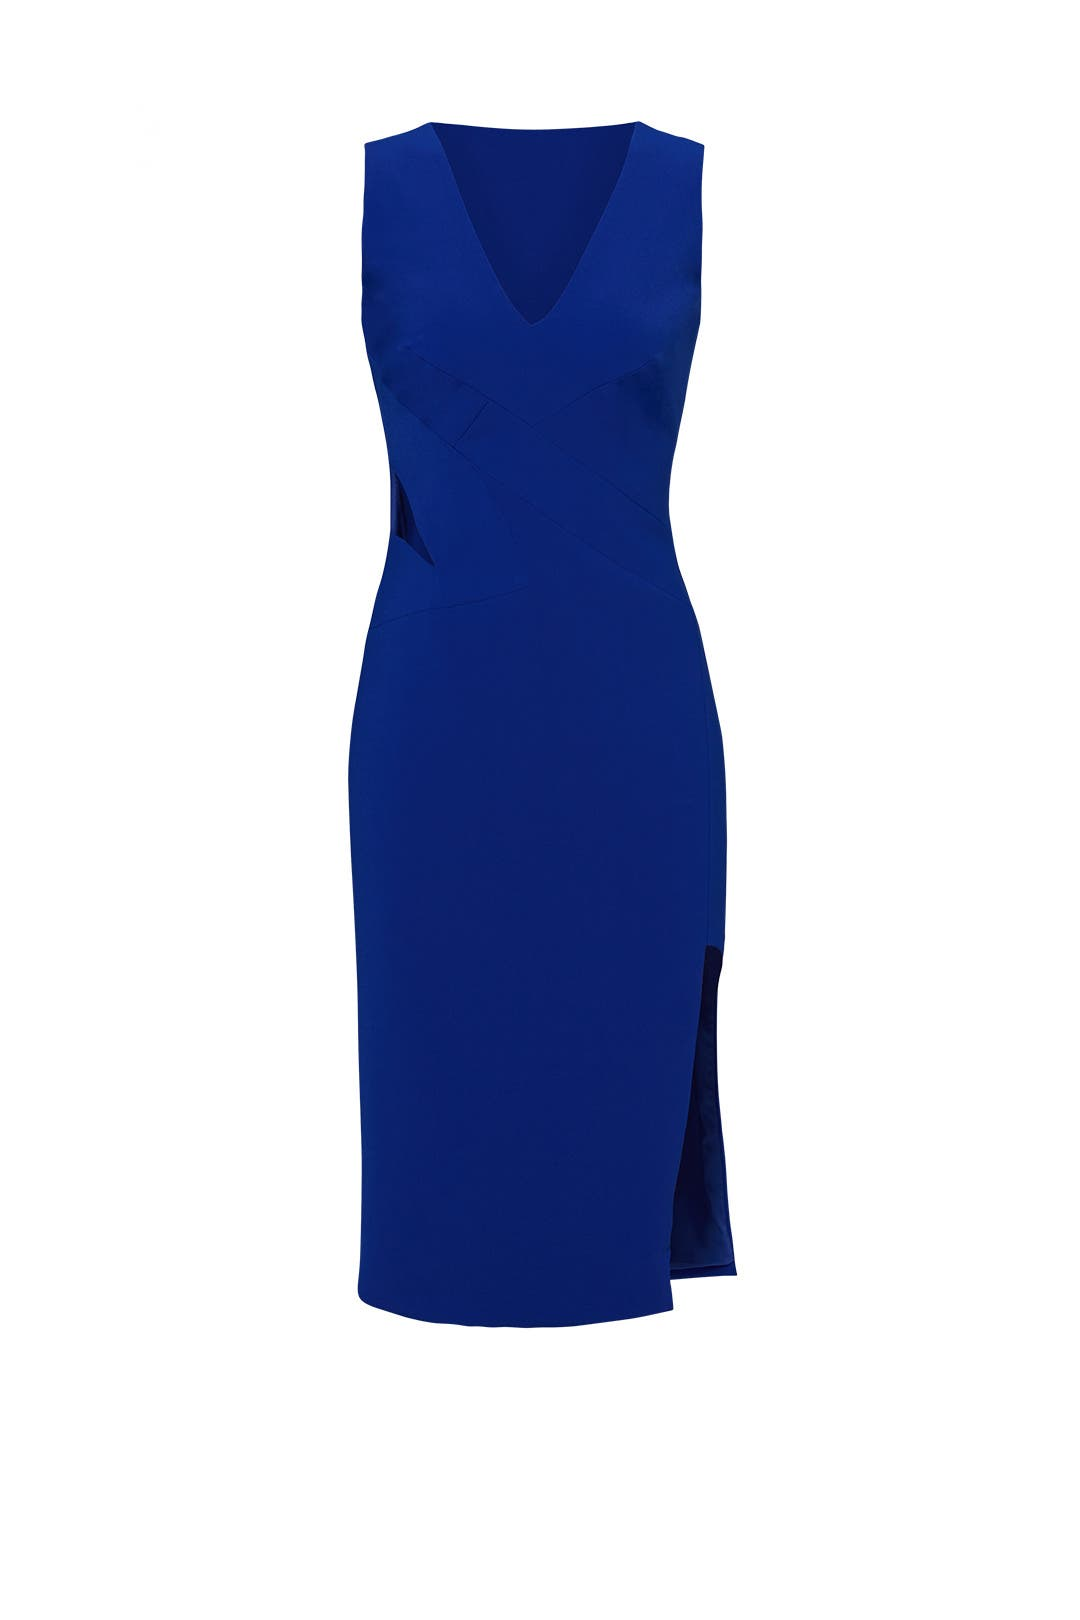 Cobalt Poise Dress By Gabriela Cadena For 170 Rent The Runway I Am Cotton Sleeveless Romper Blue Sea